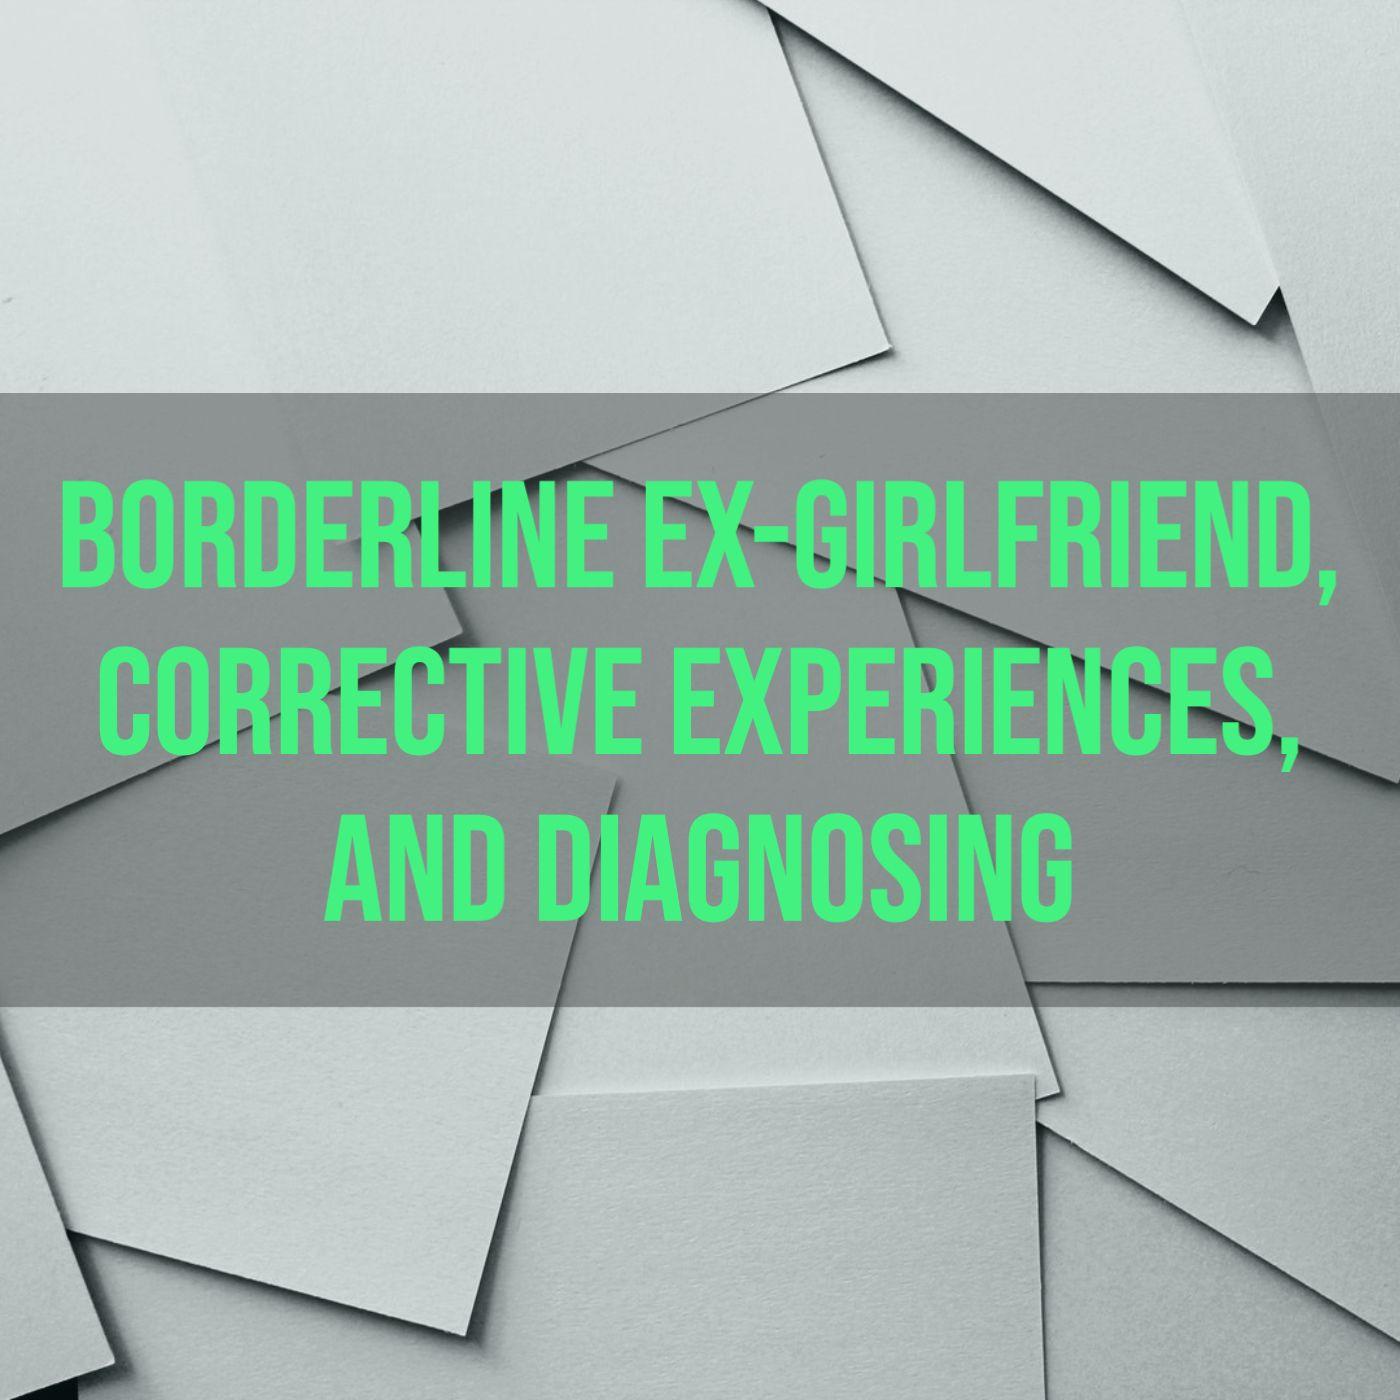 Borderline Ex-Girlfriend, Corrective Experiences, and Diagnosing